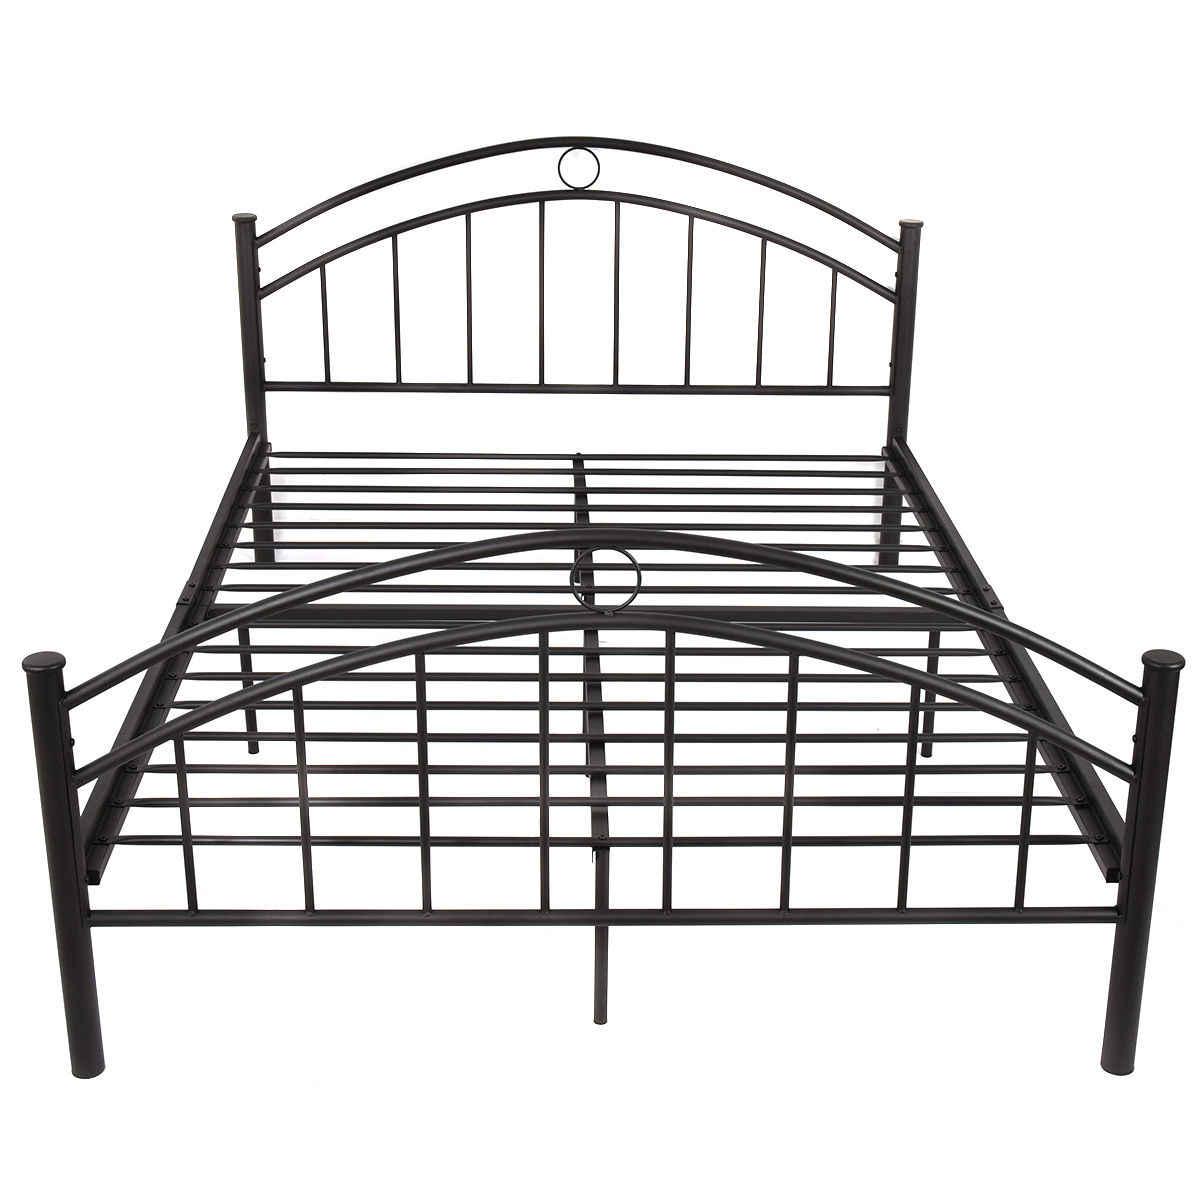 ffcae7f08634 ... Giantex Black Queen Size Metal Steel Bed Frame Mattress Platform with  Headboard Modern Bedroom Furniture HW53980+ ...